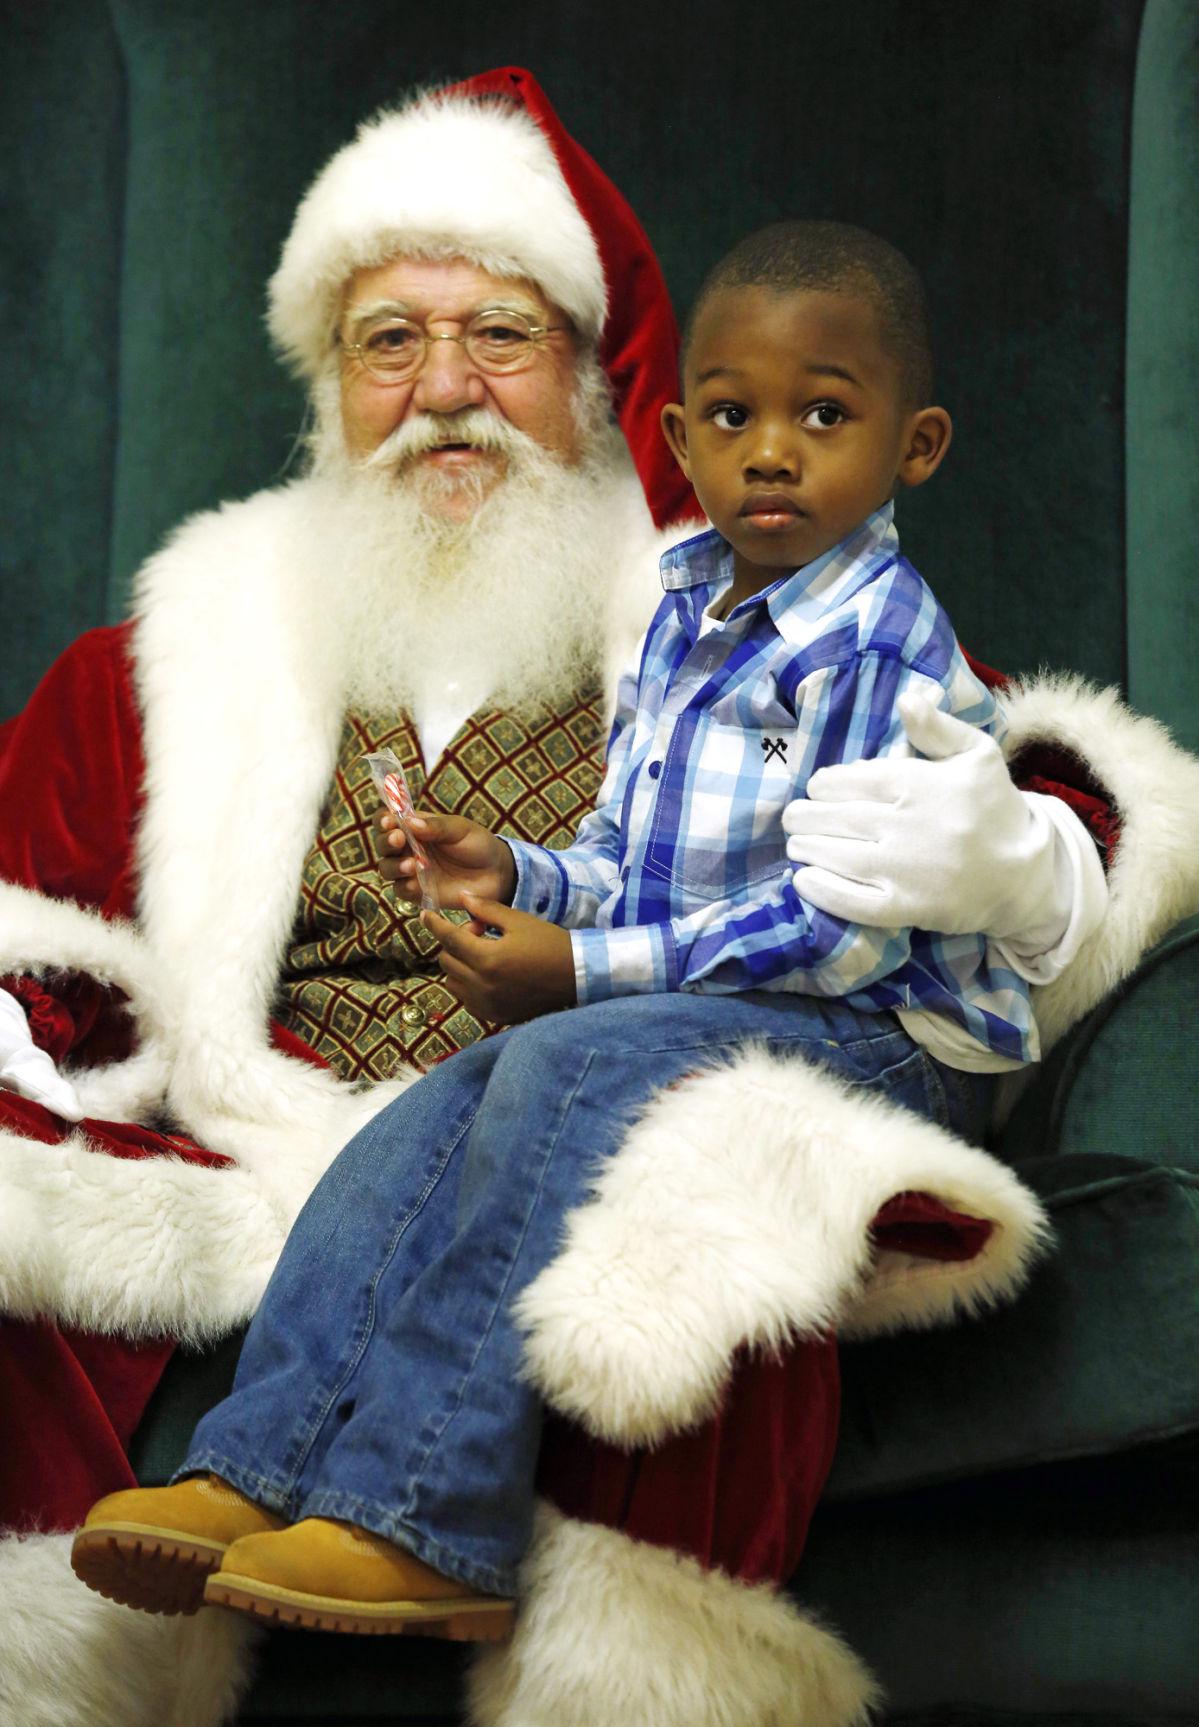 auburn opelika stores and restaurants open on christmas eve - Applebees Open Christmas